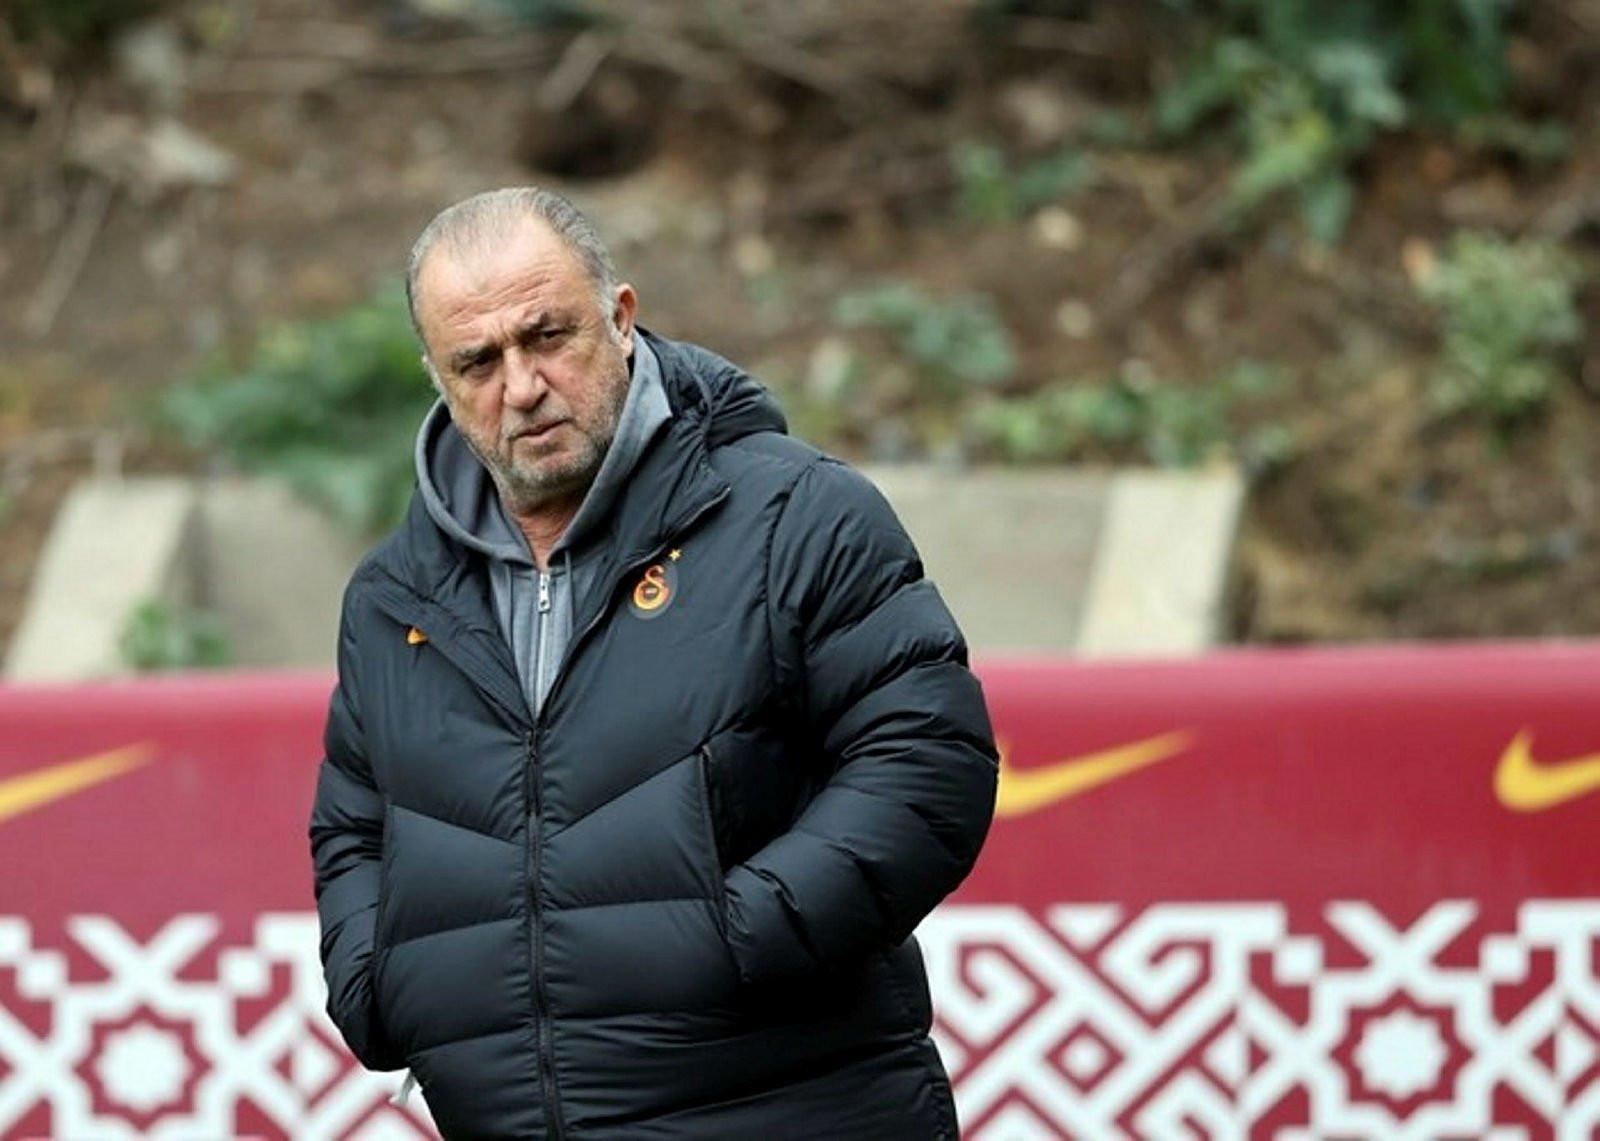 Fatih Terim kararını verdi; Falcao mu Diagne mi?